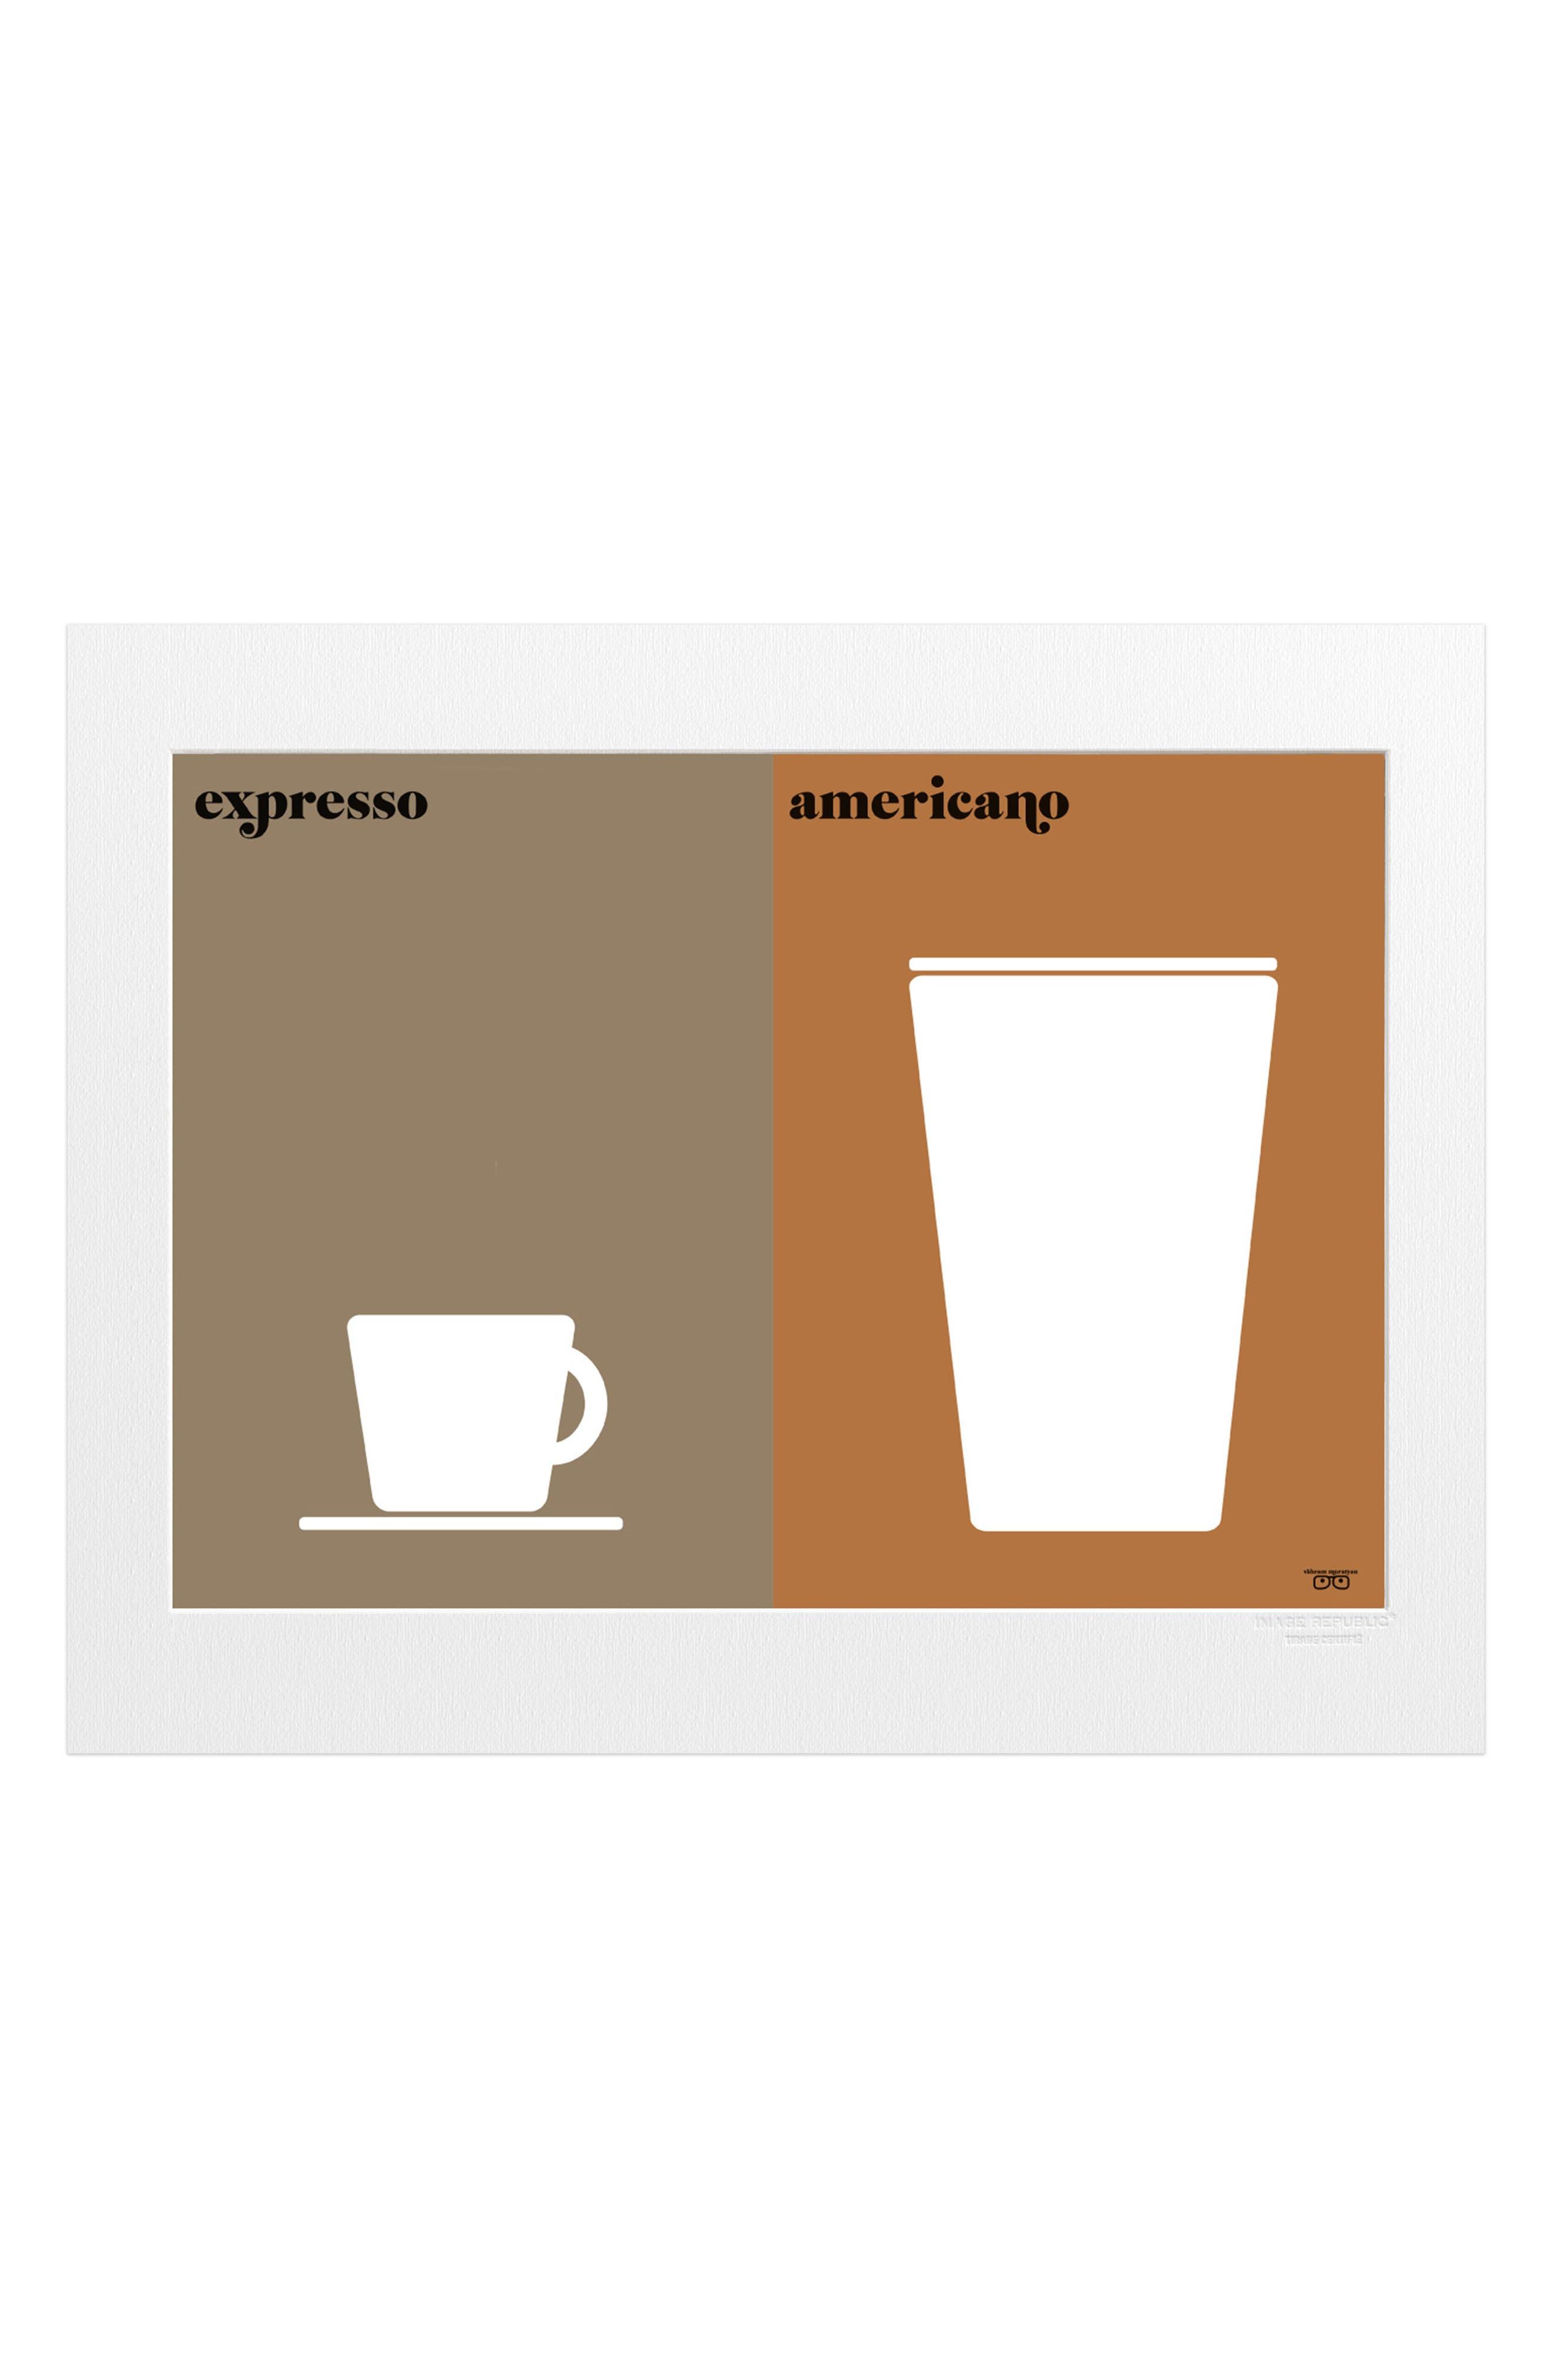 Alternate Image 1 Selected - Image Republic Vahram Le Cafe Print